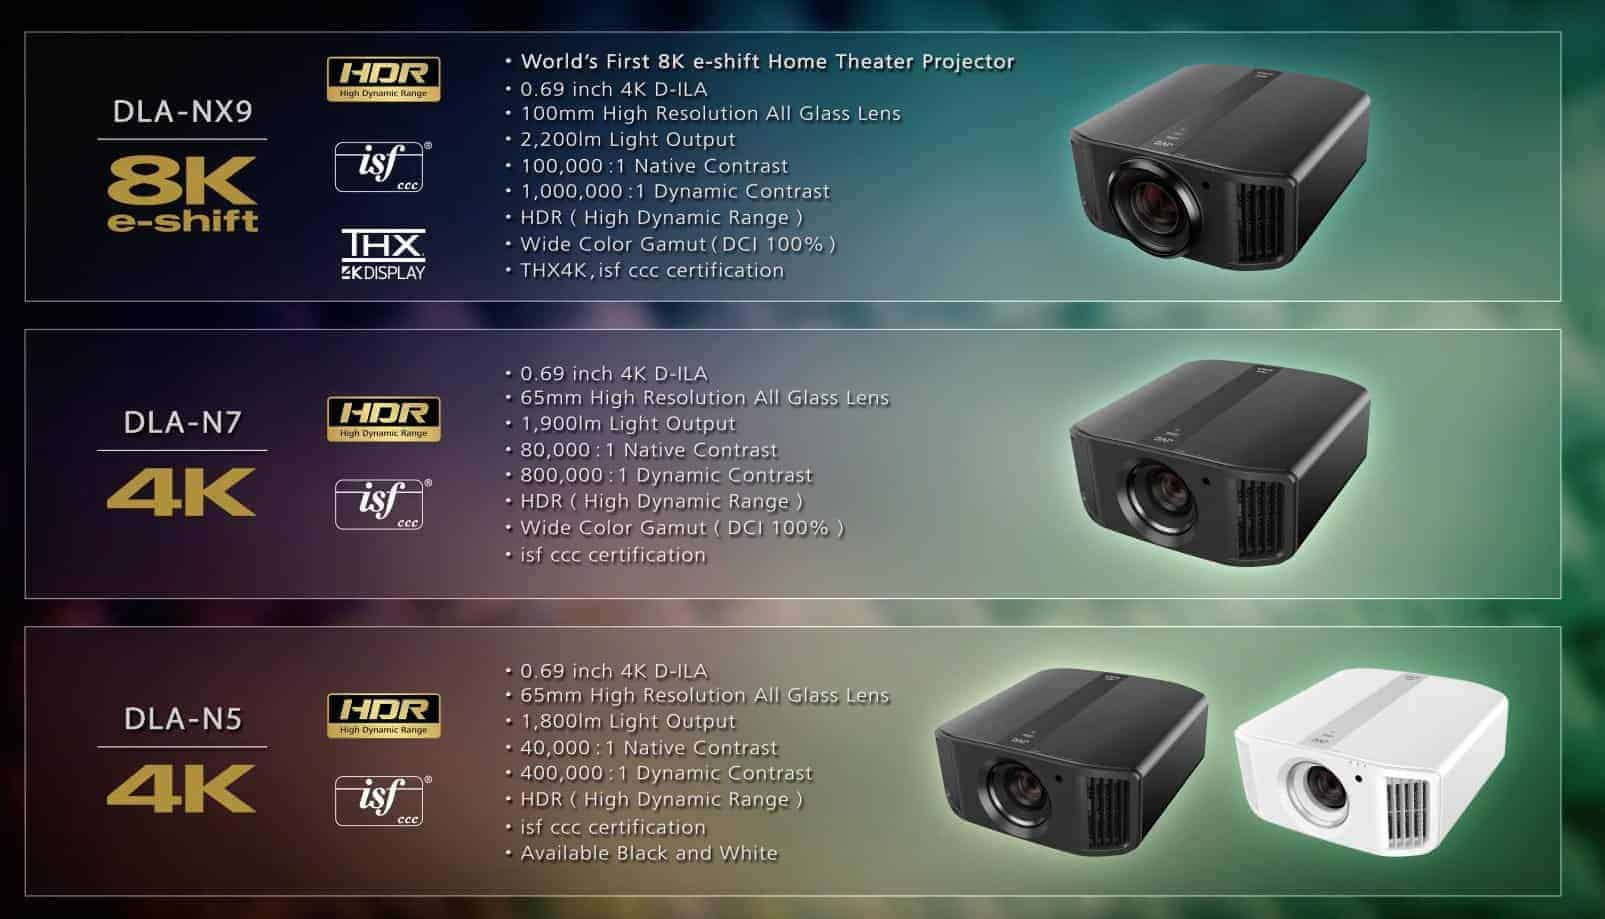 JVC DLA-N5 4K D-ILA HDR